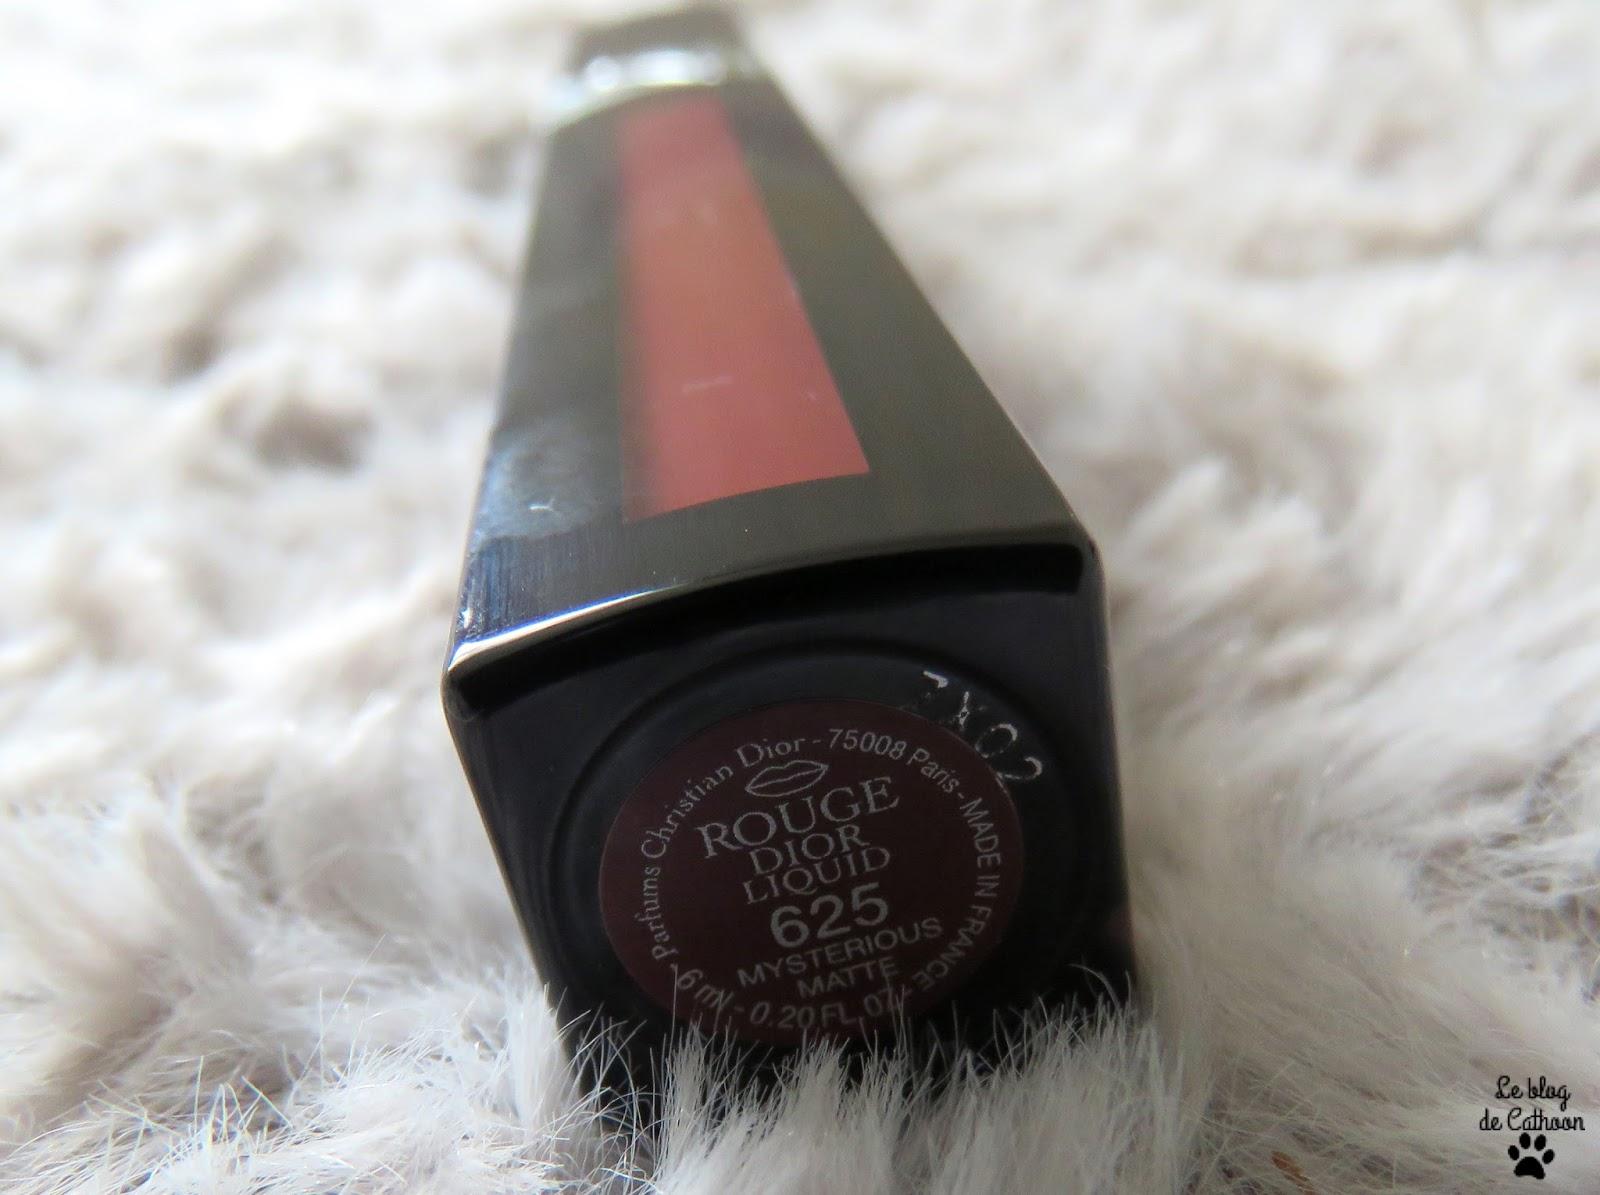 Rouge Dior Liquid - Matte - 625 Mysterious Matte - Dior